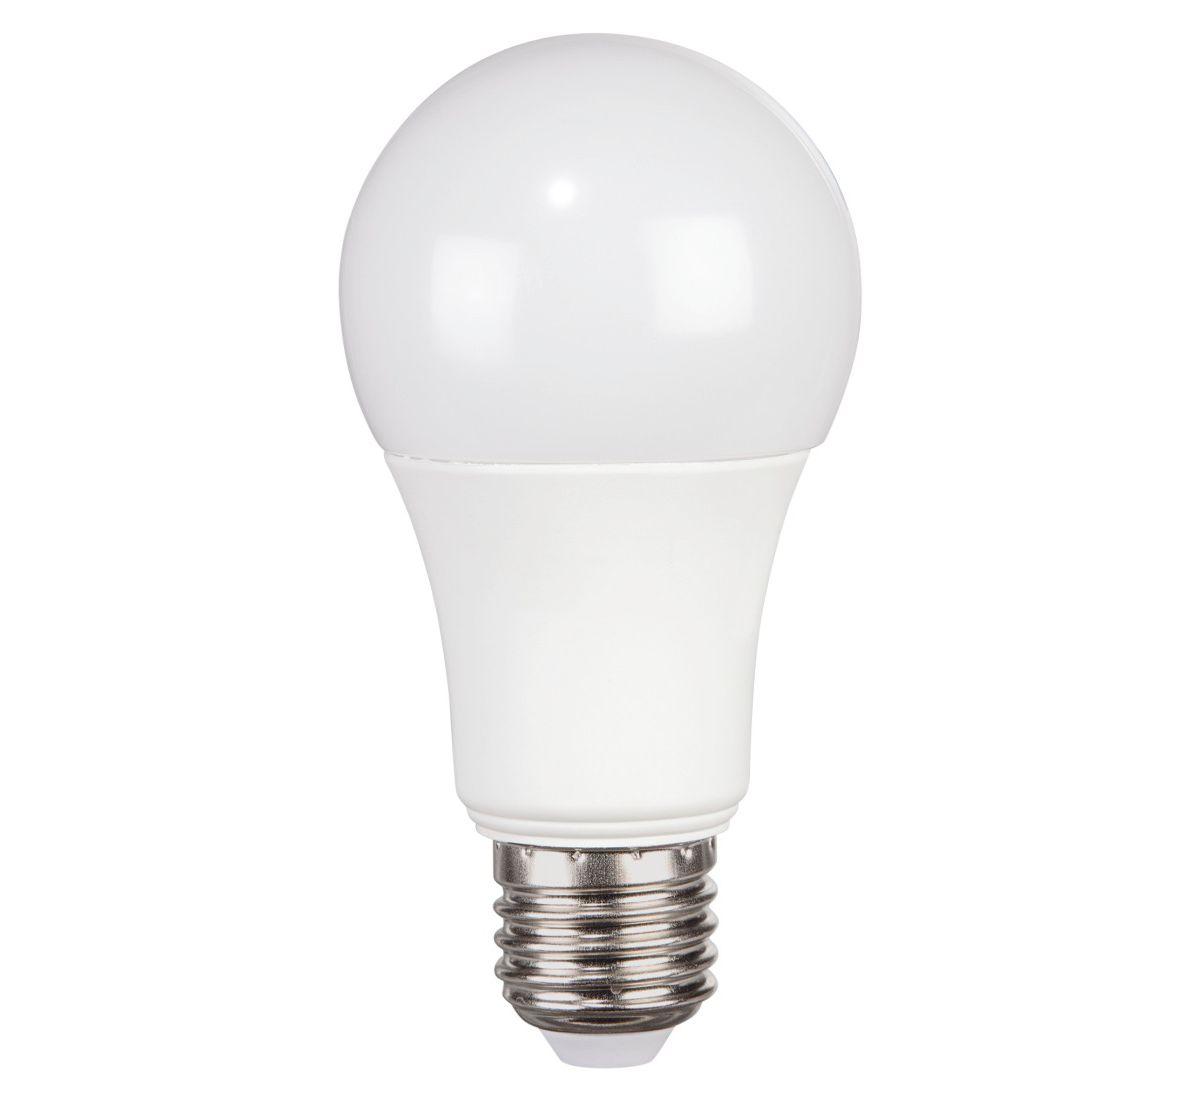 Xavax LED-Lampe, E27, 1060lm ersetzt 75W, Glühl...